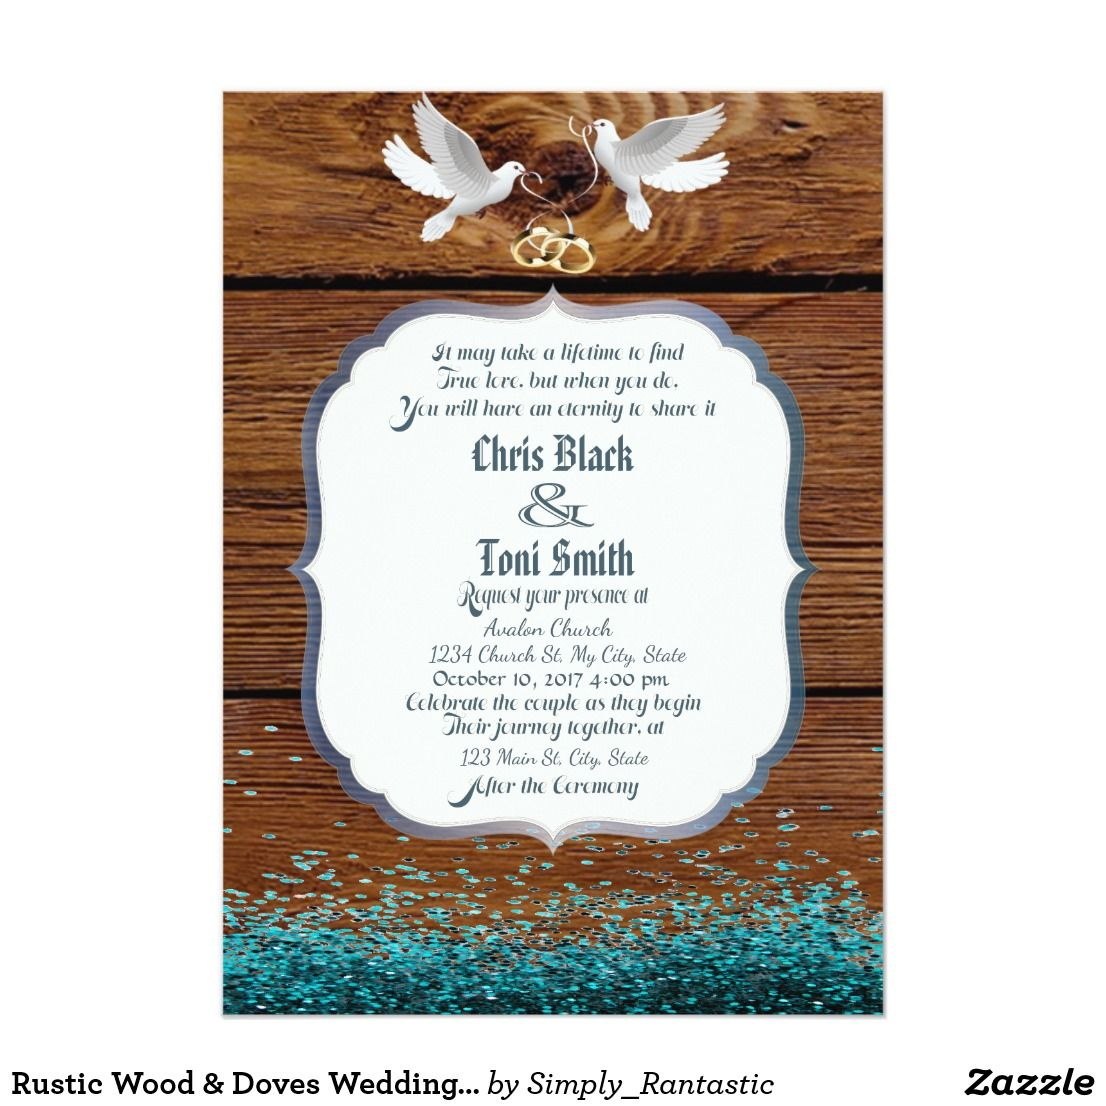 Rustic Wood & Doves Wedding Invite w/ glitter | Rustic wood, Wedding ...